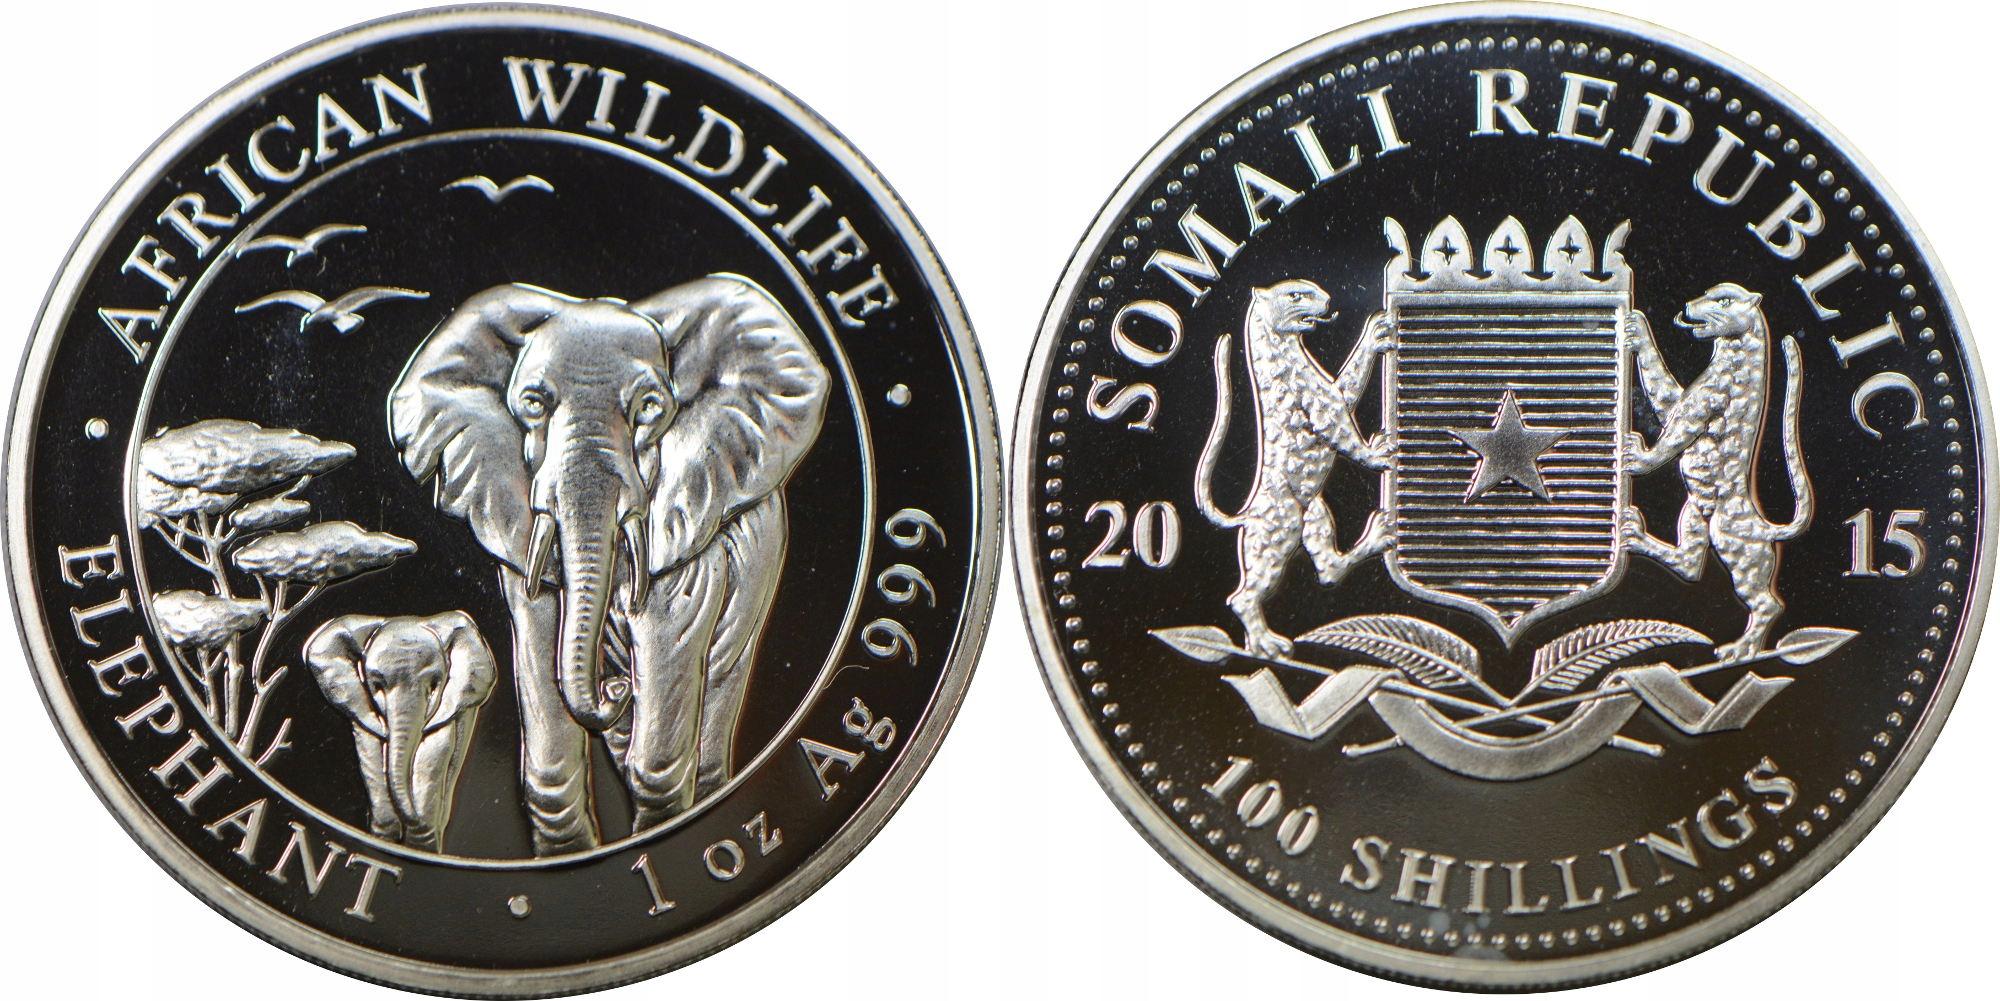 1LB. SOMALIA 100 SH 2015 SŁONIE SREBRO GCN 20.02